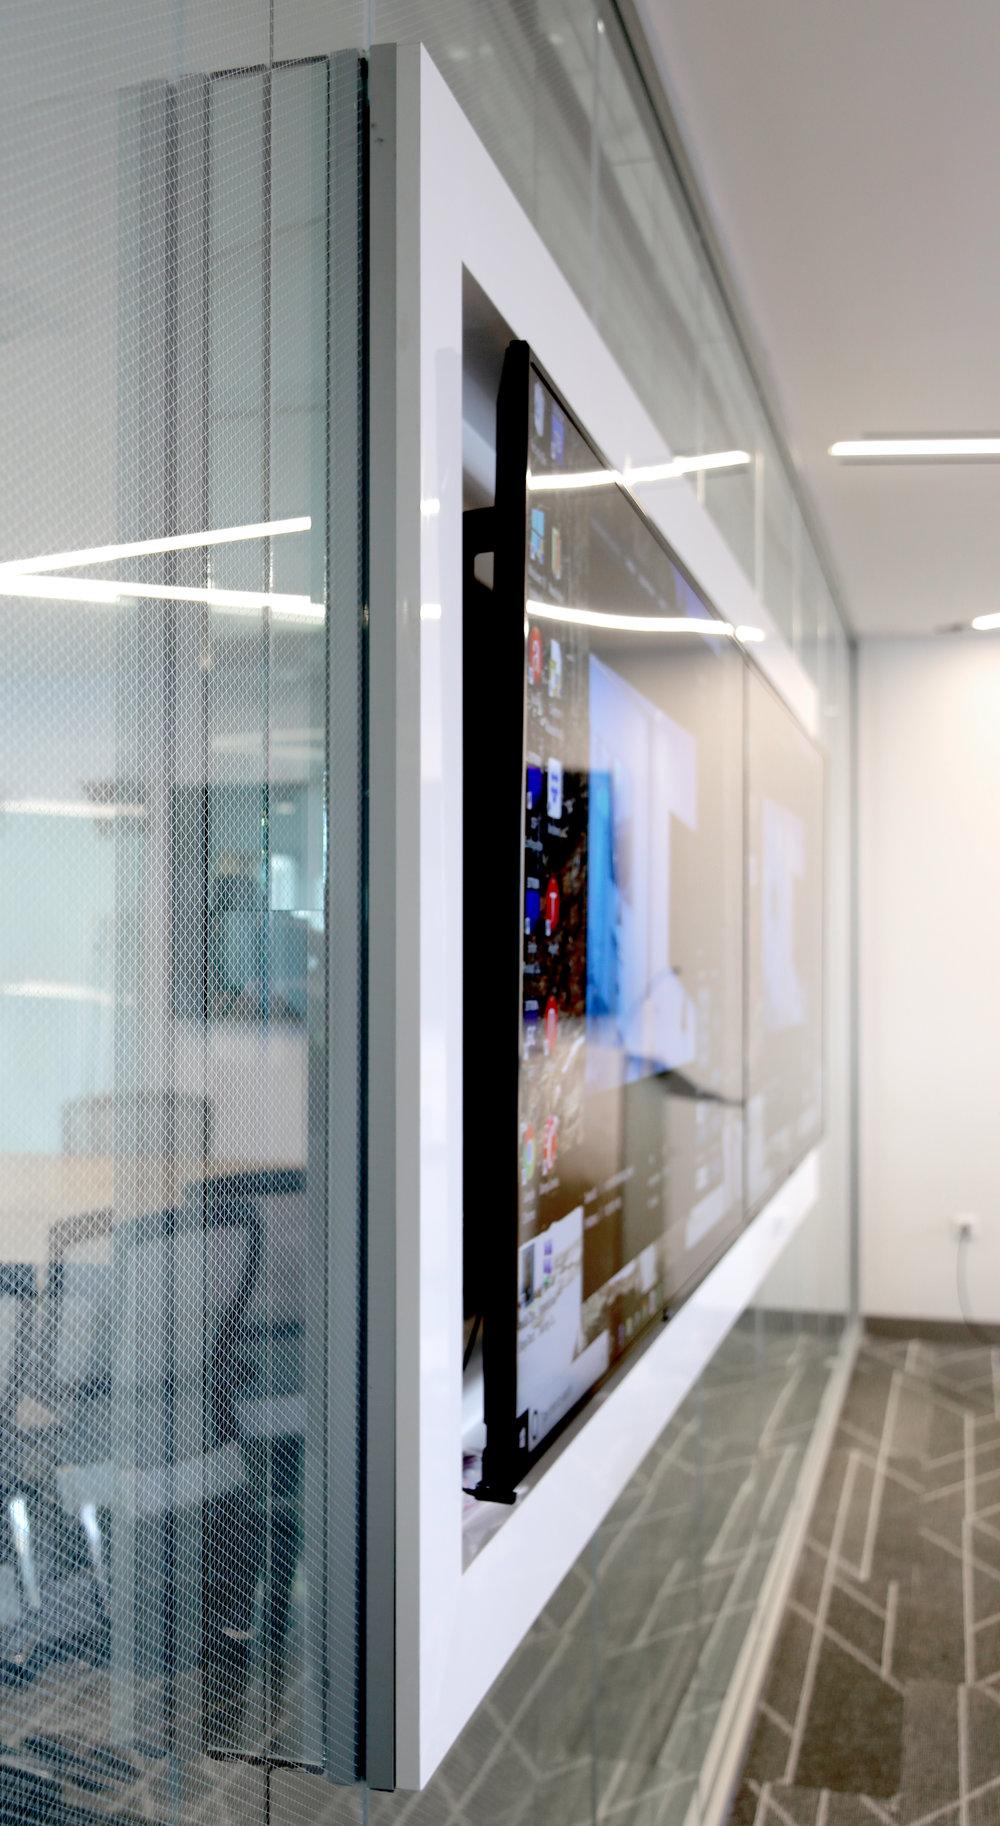 Litespace Custom Pattern Etched Glass - Spaceworks AI.jpg